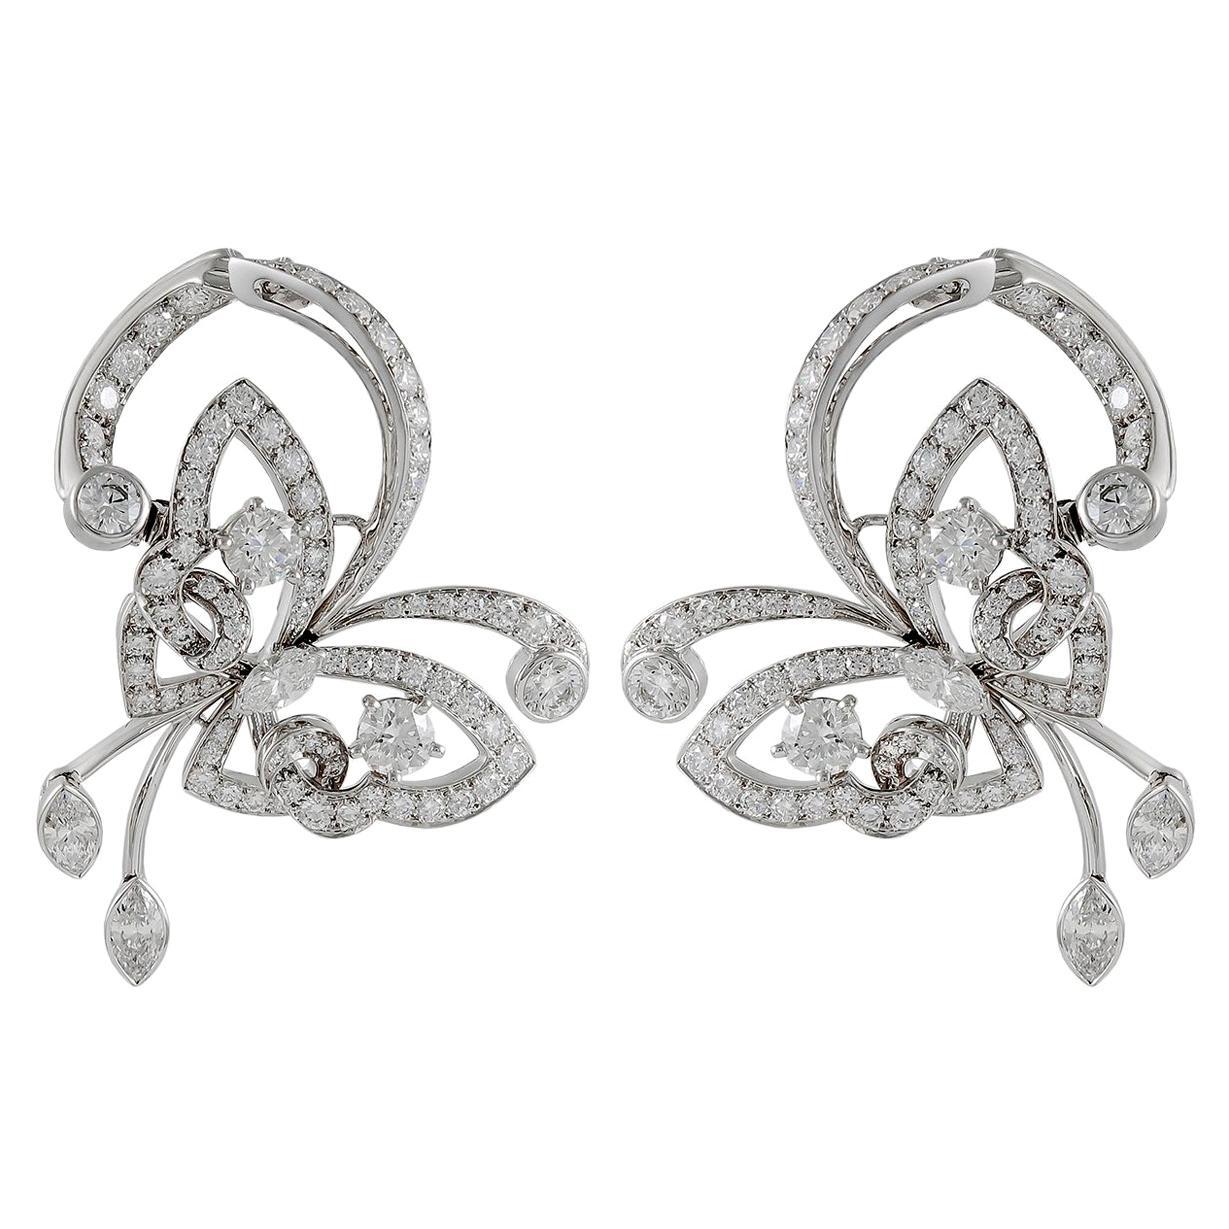 Van Cleef & Arpels Diamond White Gold Flying Butterfly Earrings